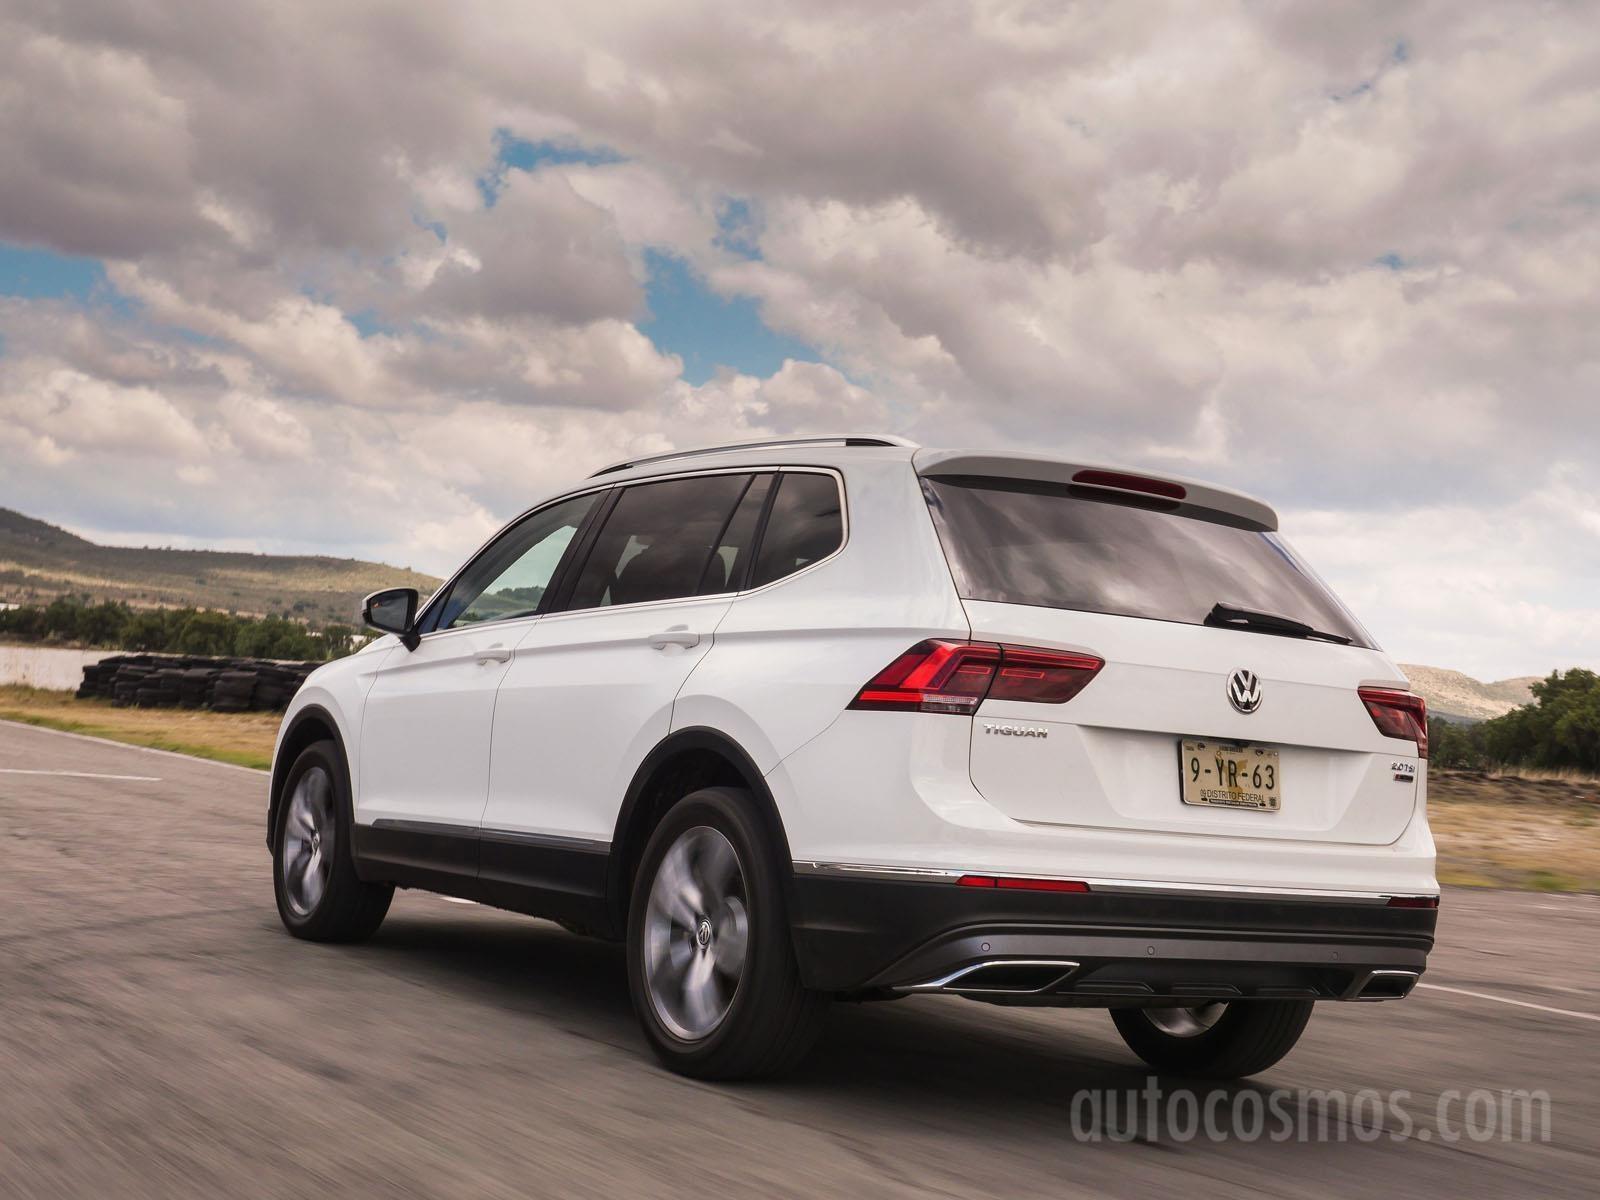 Volkswagen Tiguan 2018 Llega A M 233 Xico Desde 399 990 Pesos